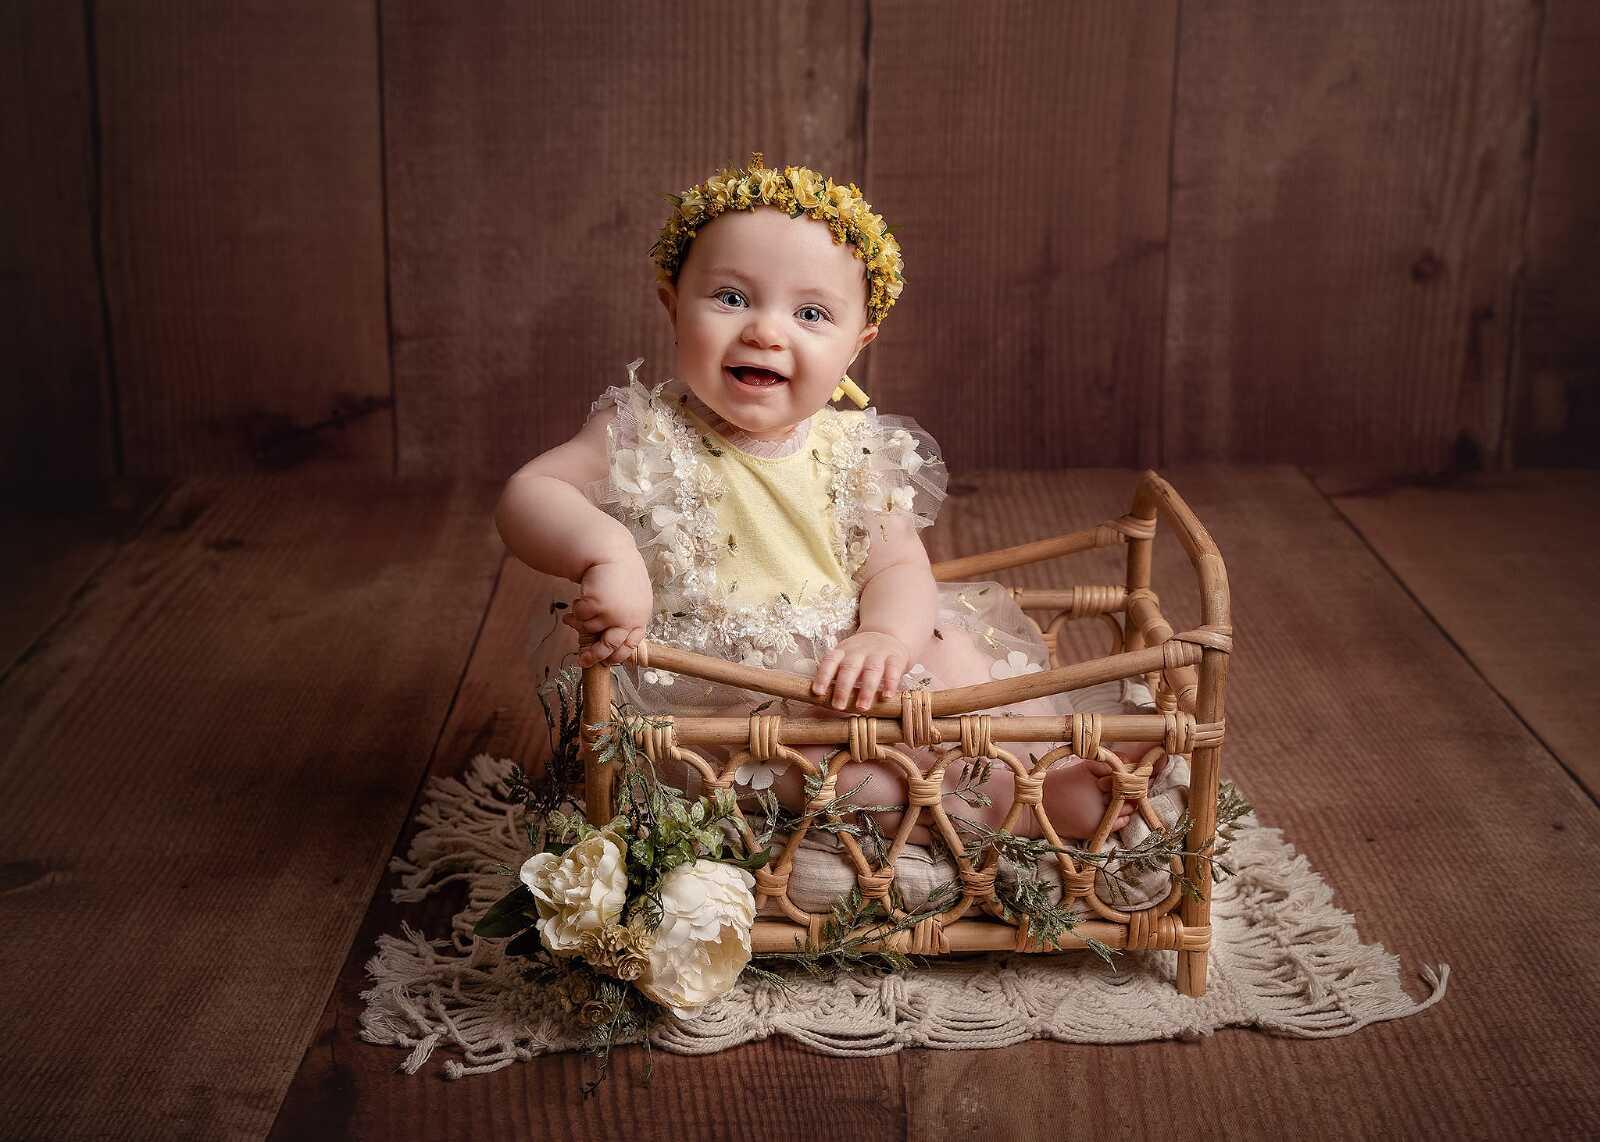 Baby girl sitter photo in studio Hereford, Herefordshire